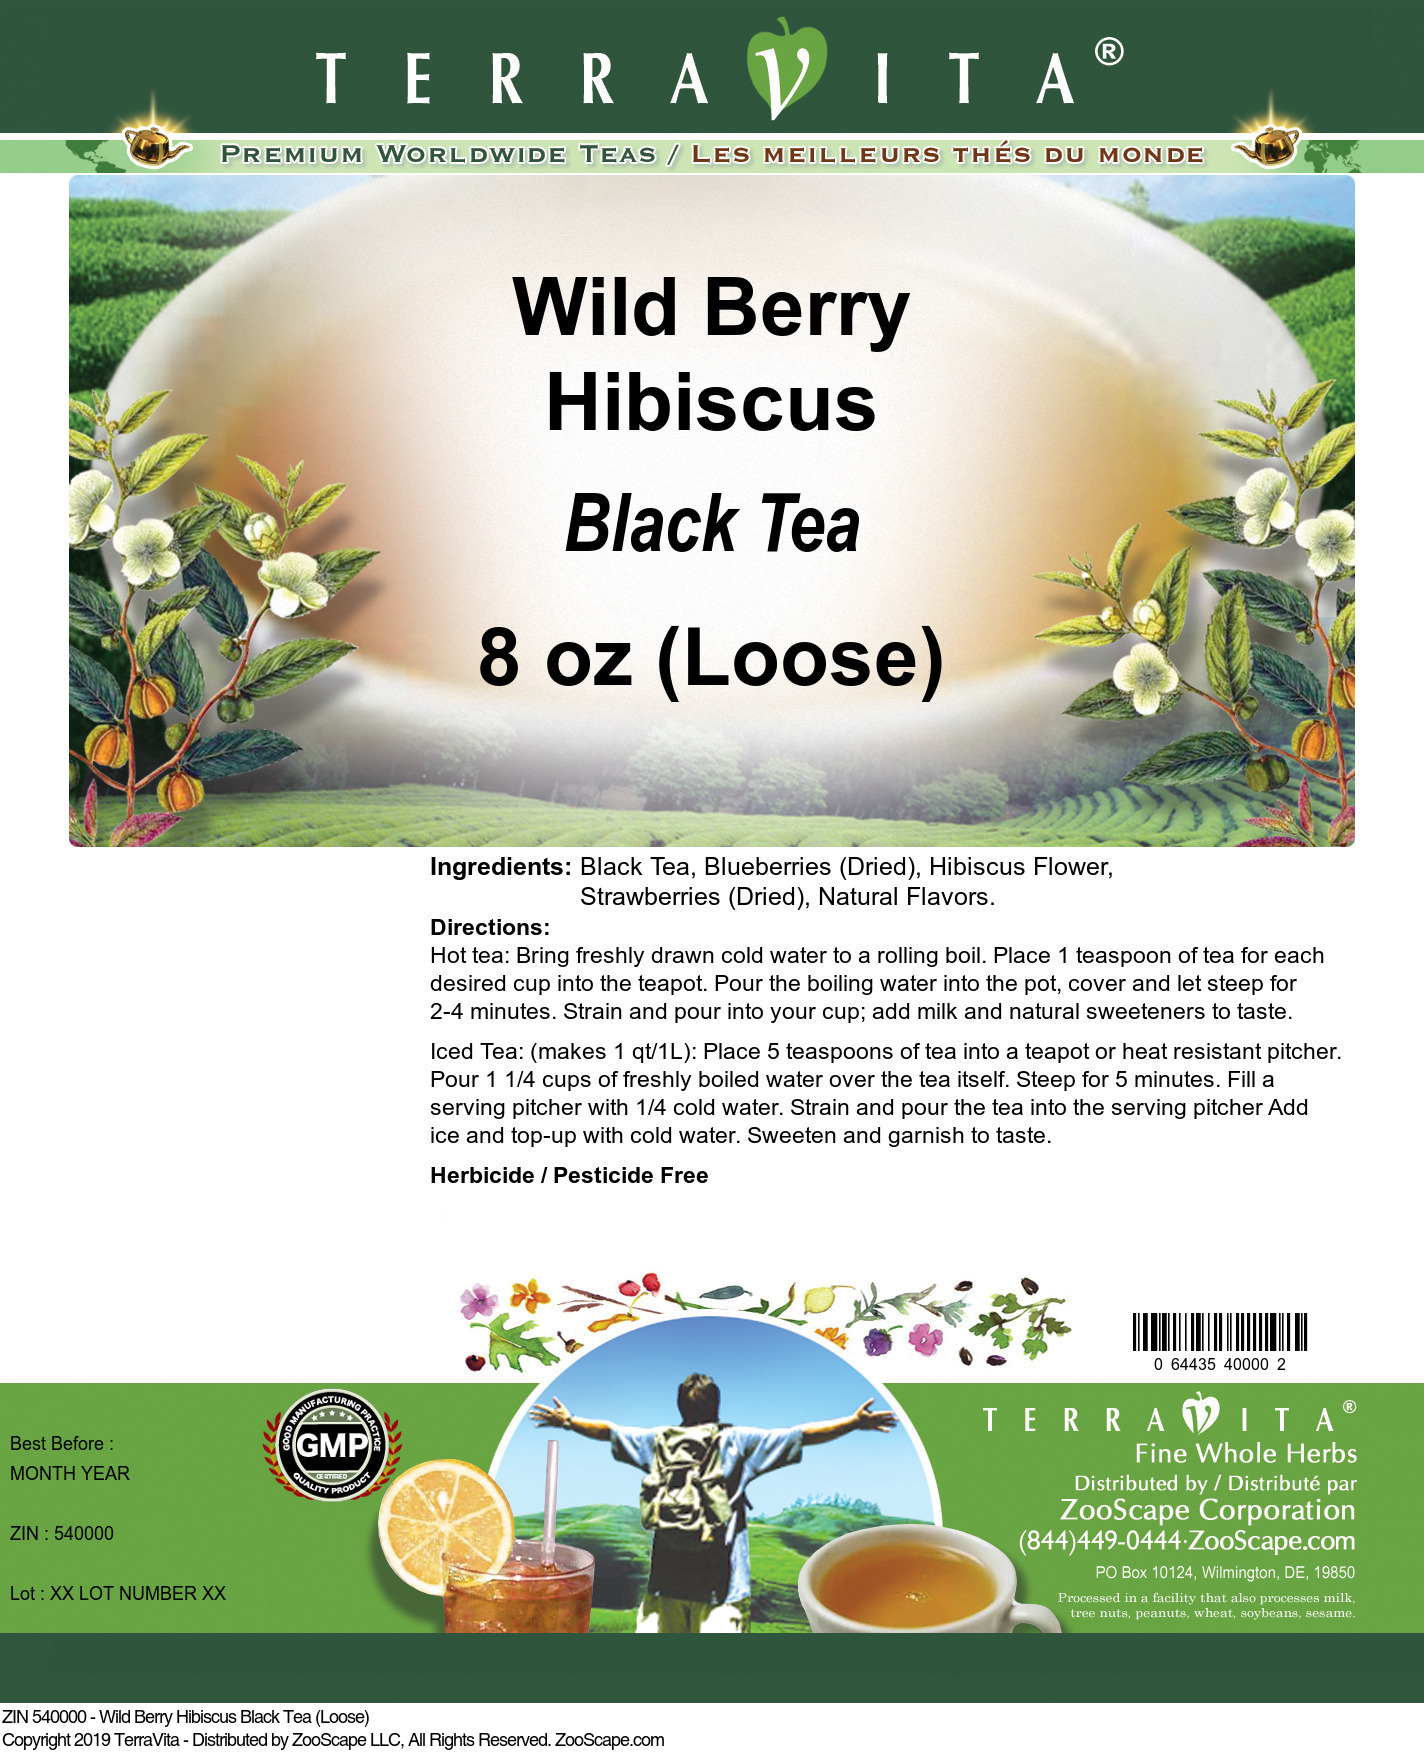 Wild Berry Hibiscus Black Tea